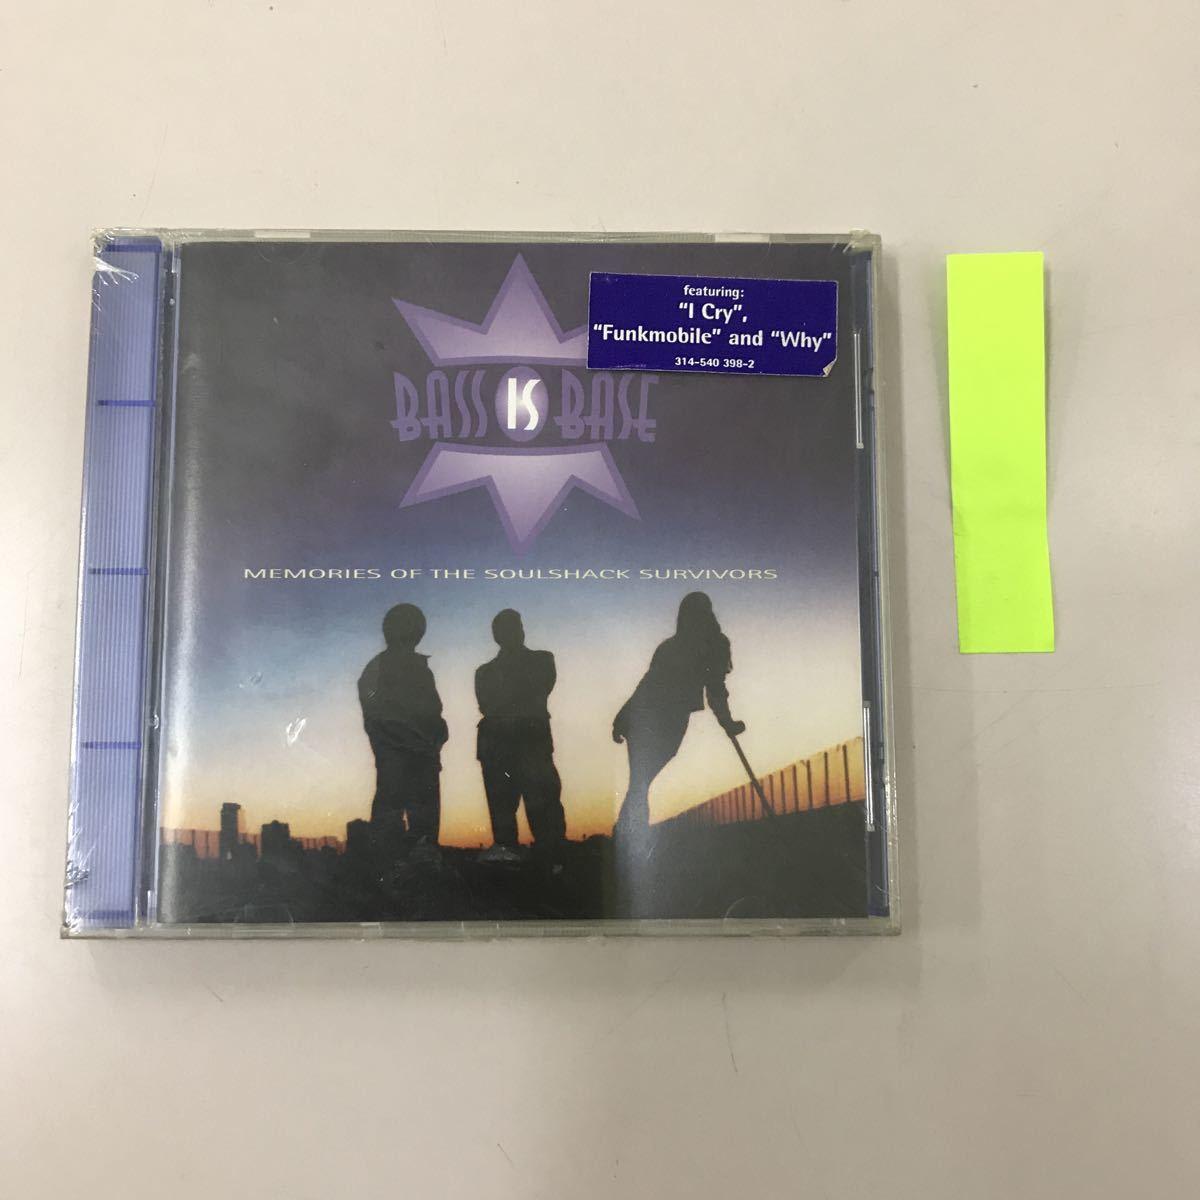 CD 輸入盤未開封【洋楽】長期保存品 BASS IS BASE